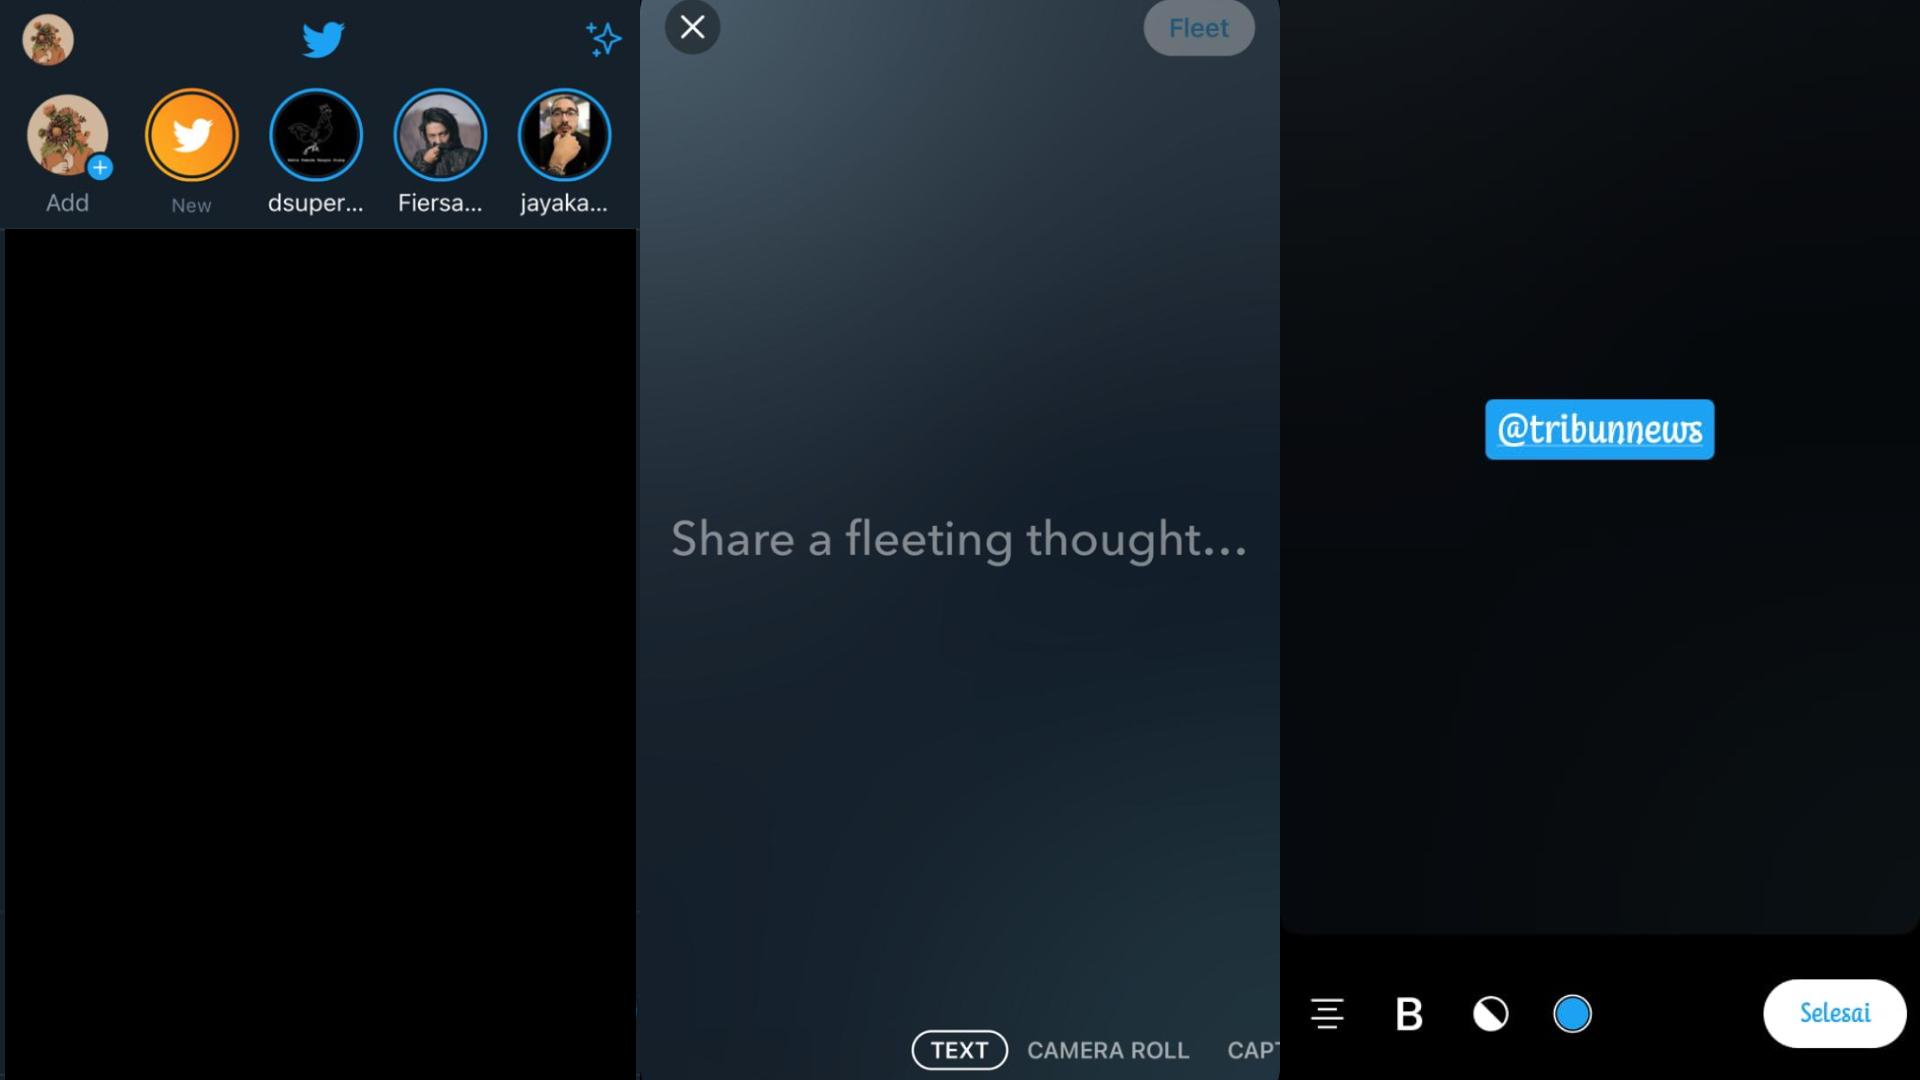 Tangkap layar Fitur Fleet Twitter. Ini cara menggunakan Fitur Fleet Twitter atau Twitter Story